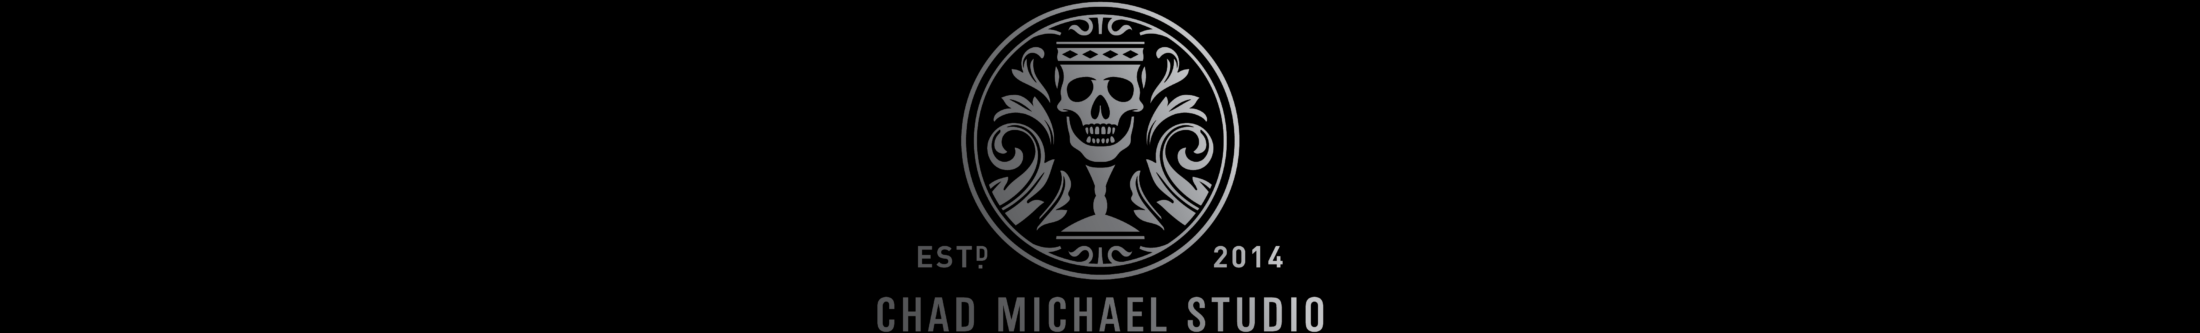 Chad Michael Studio